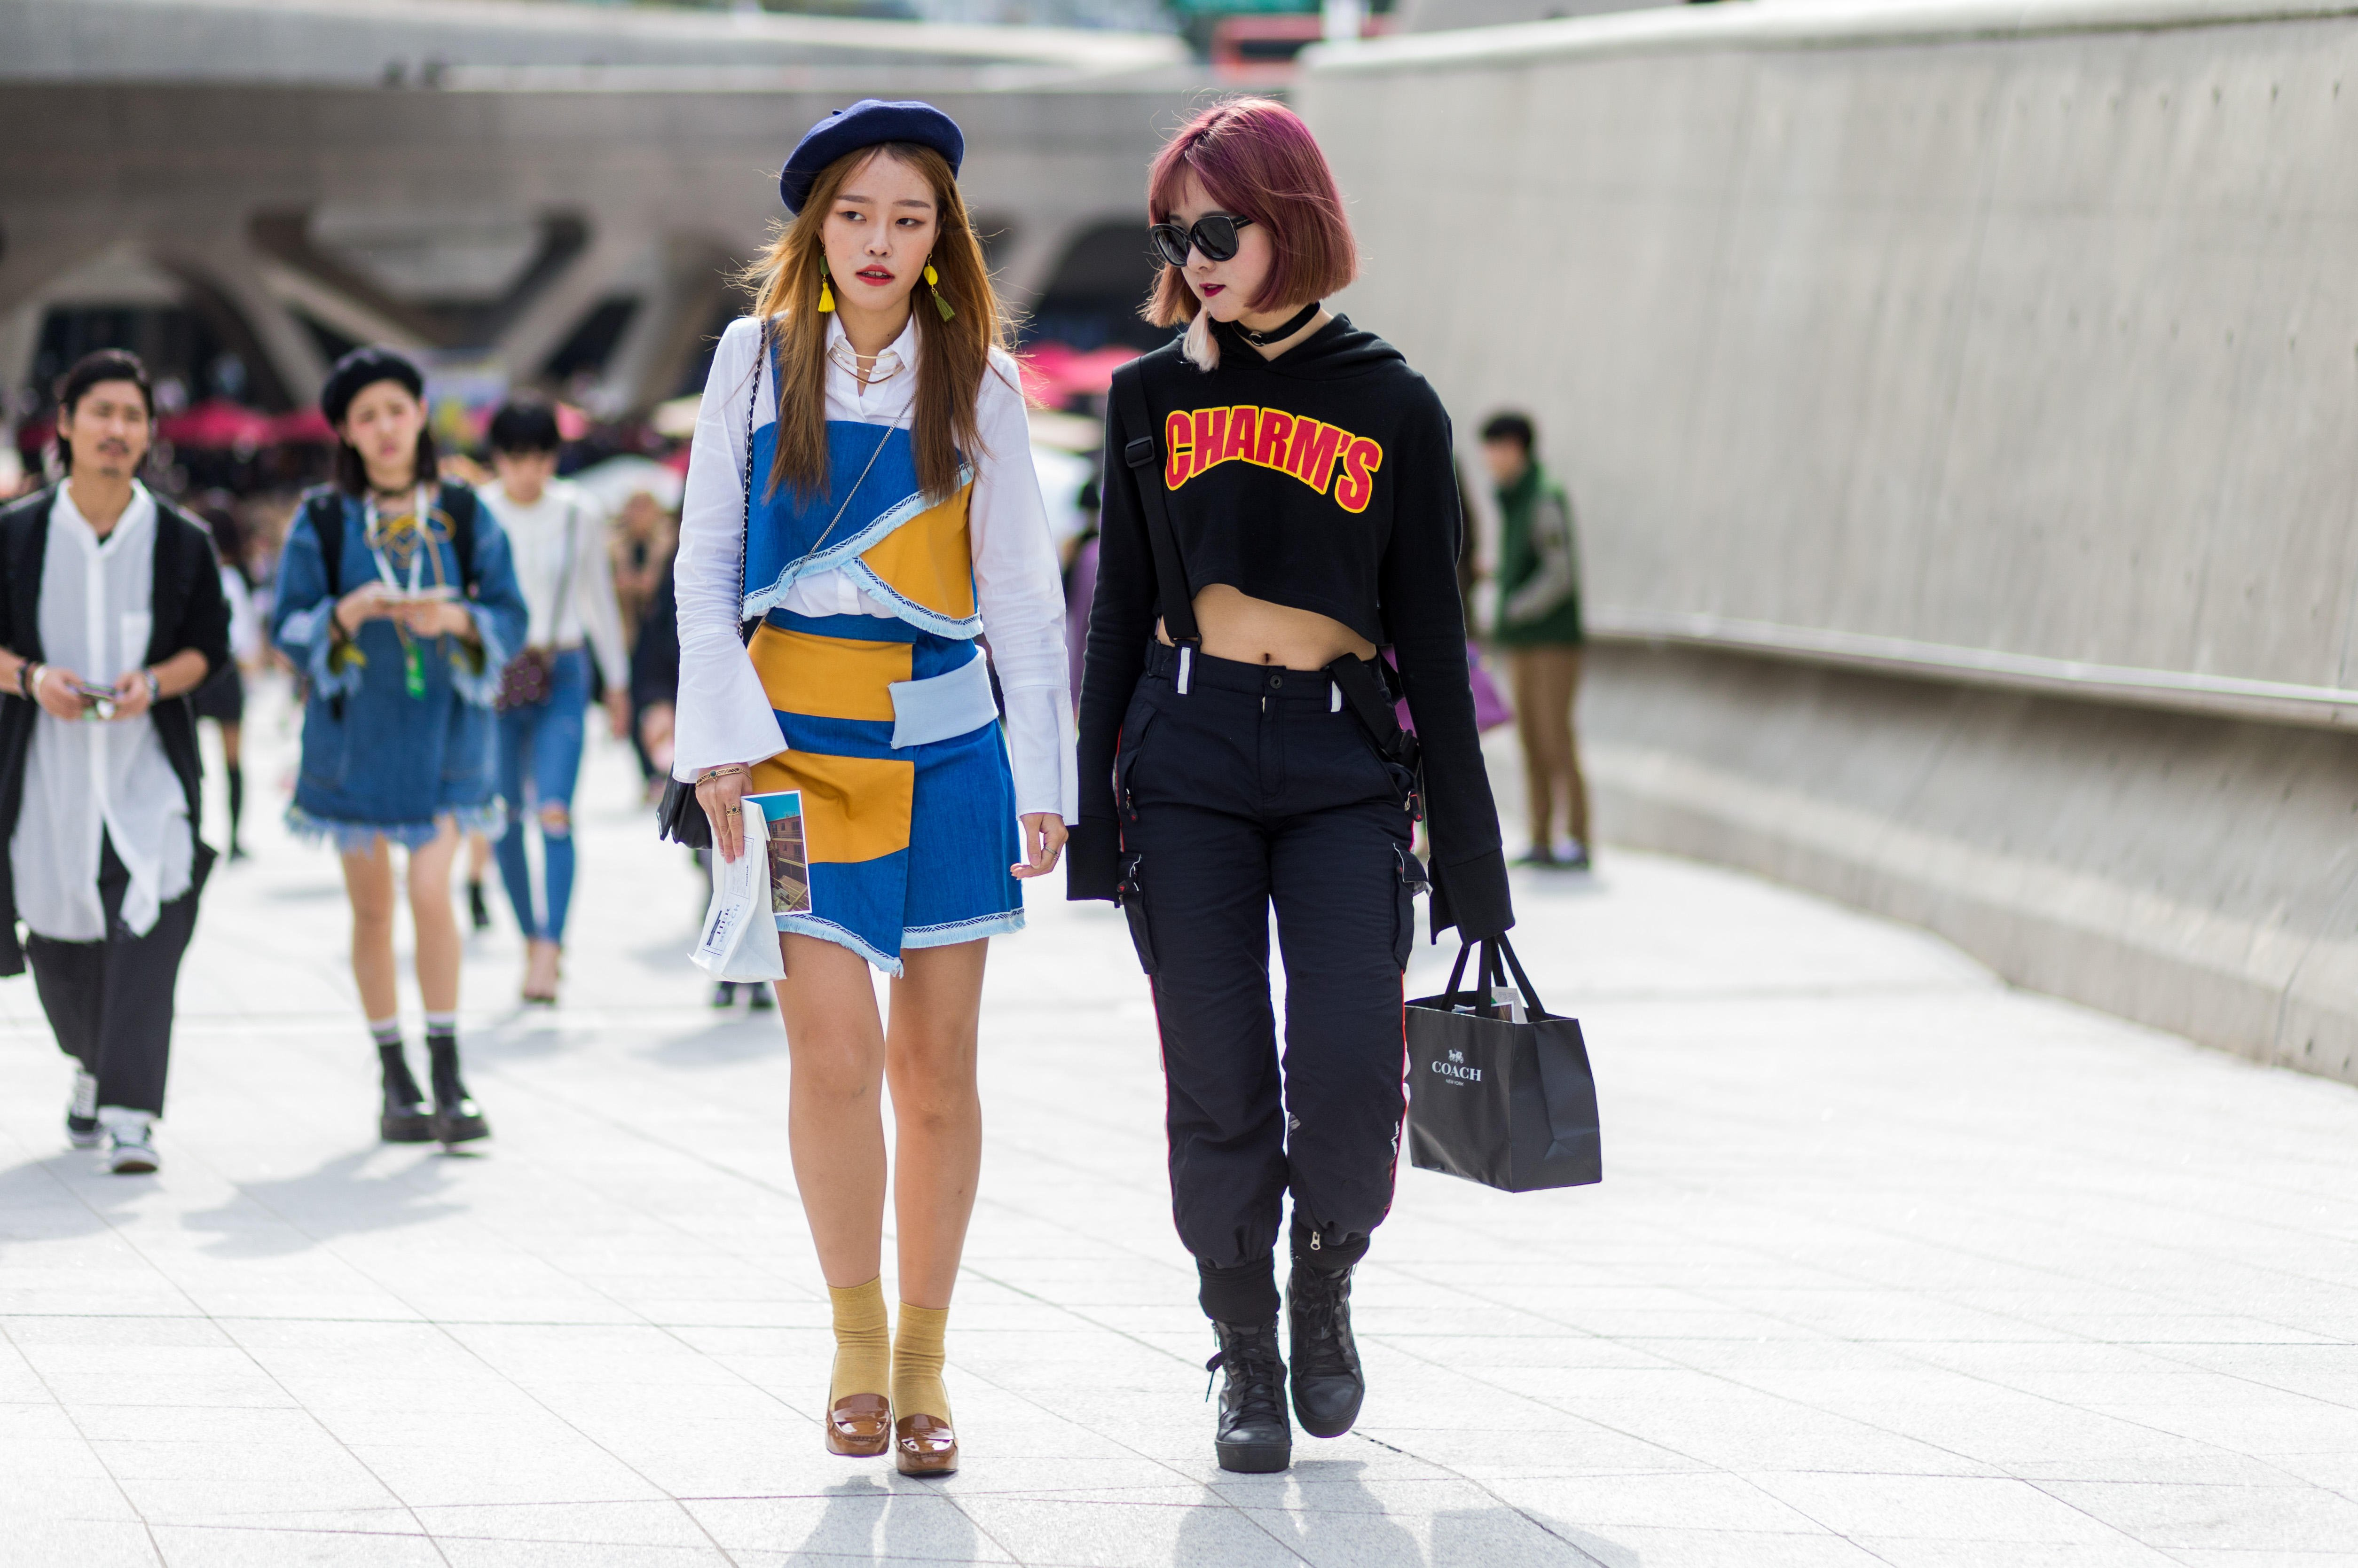 Korean streetwear takes the global fashion scene by storm  South